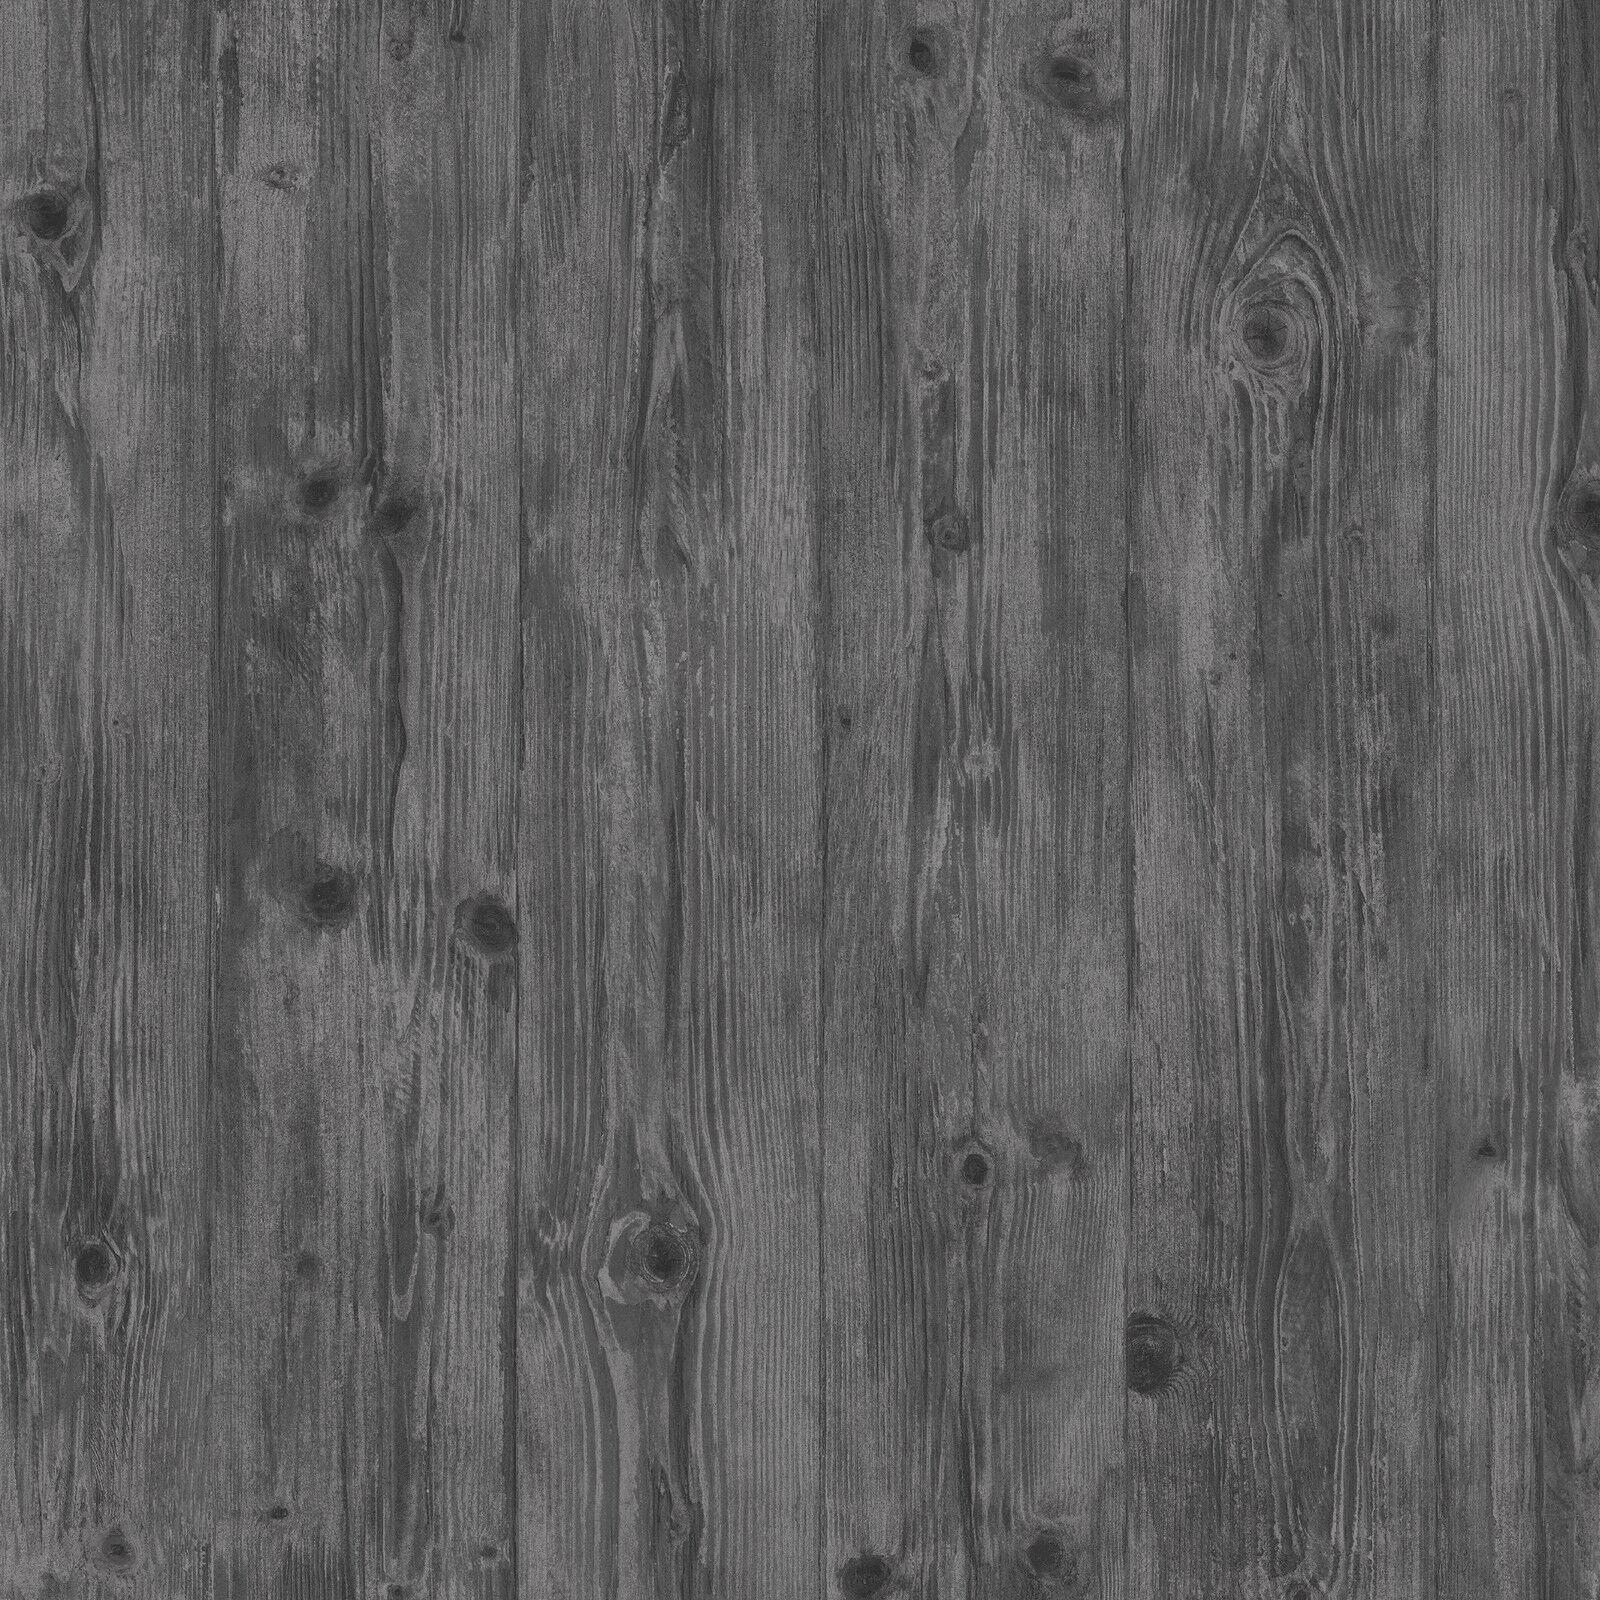 Essener Tapete Kitchen Style 3 LL36207 Holz Holzwand Paneele Vinyltapete Vinyl